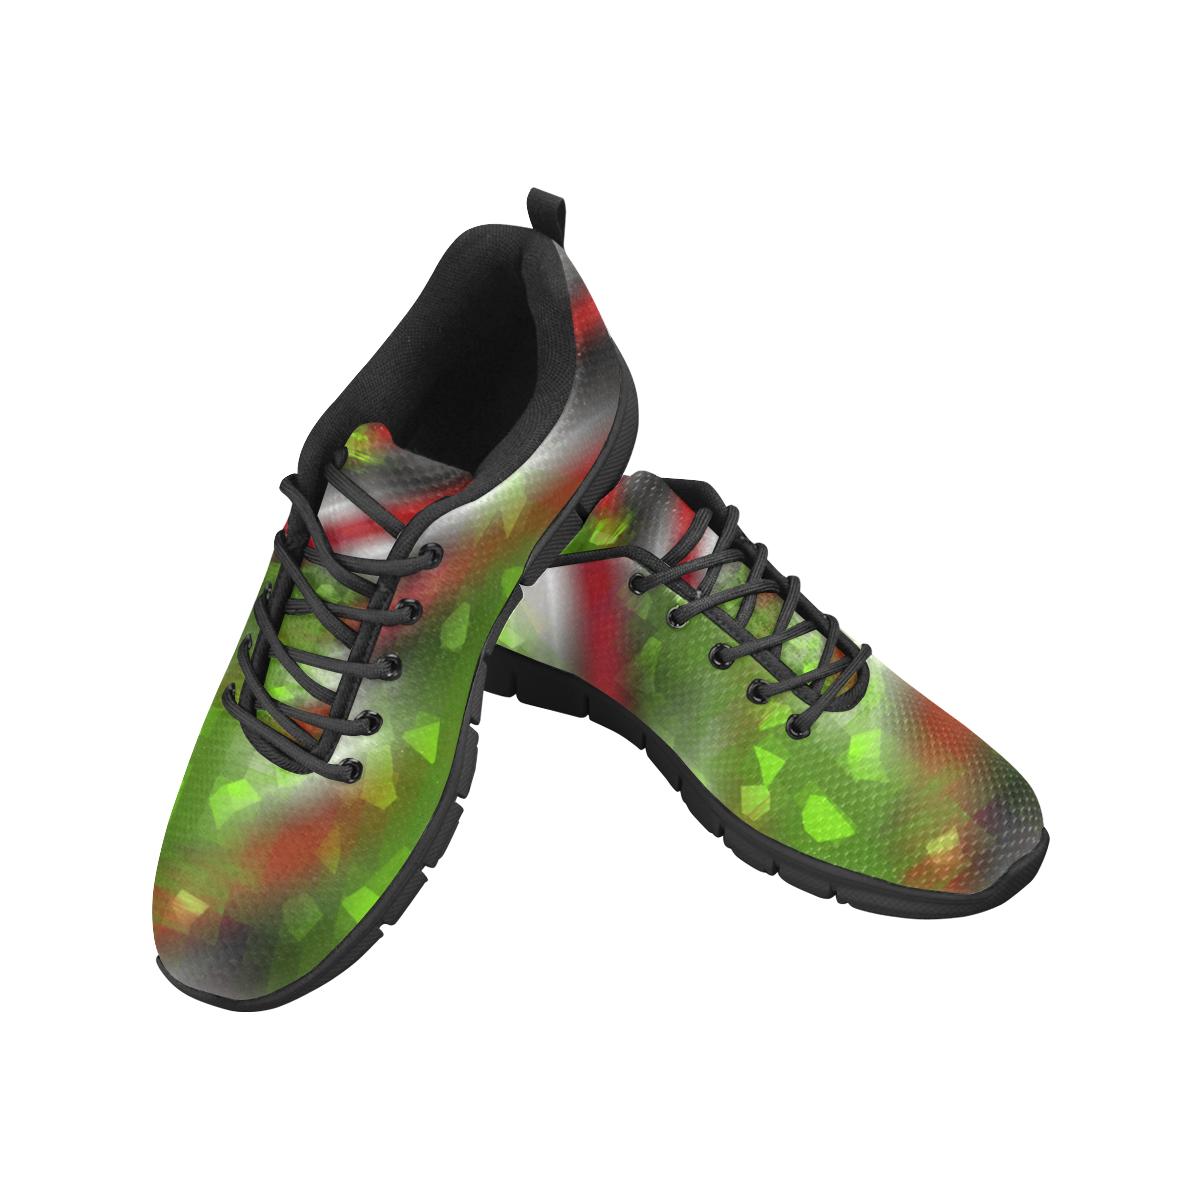 bkg20131 Men's Breathable Running Shoes/Large (Model 055)